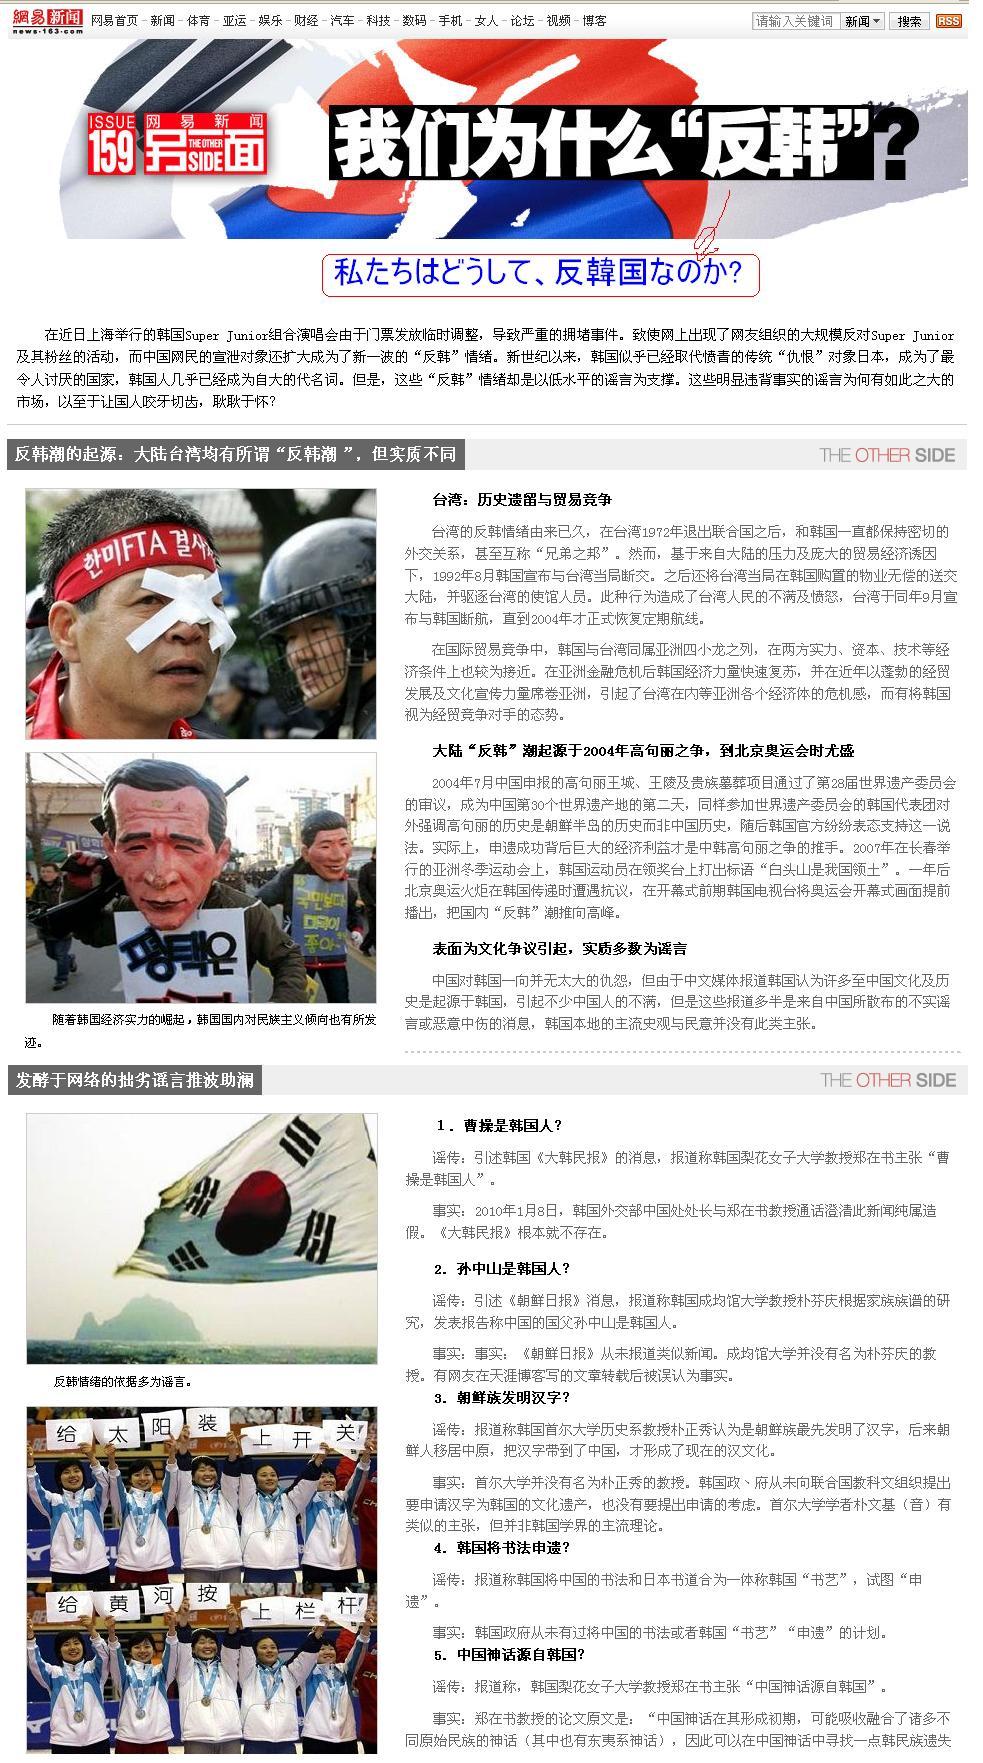 hankanchina2010www1.jpg